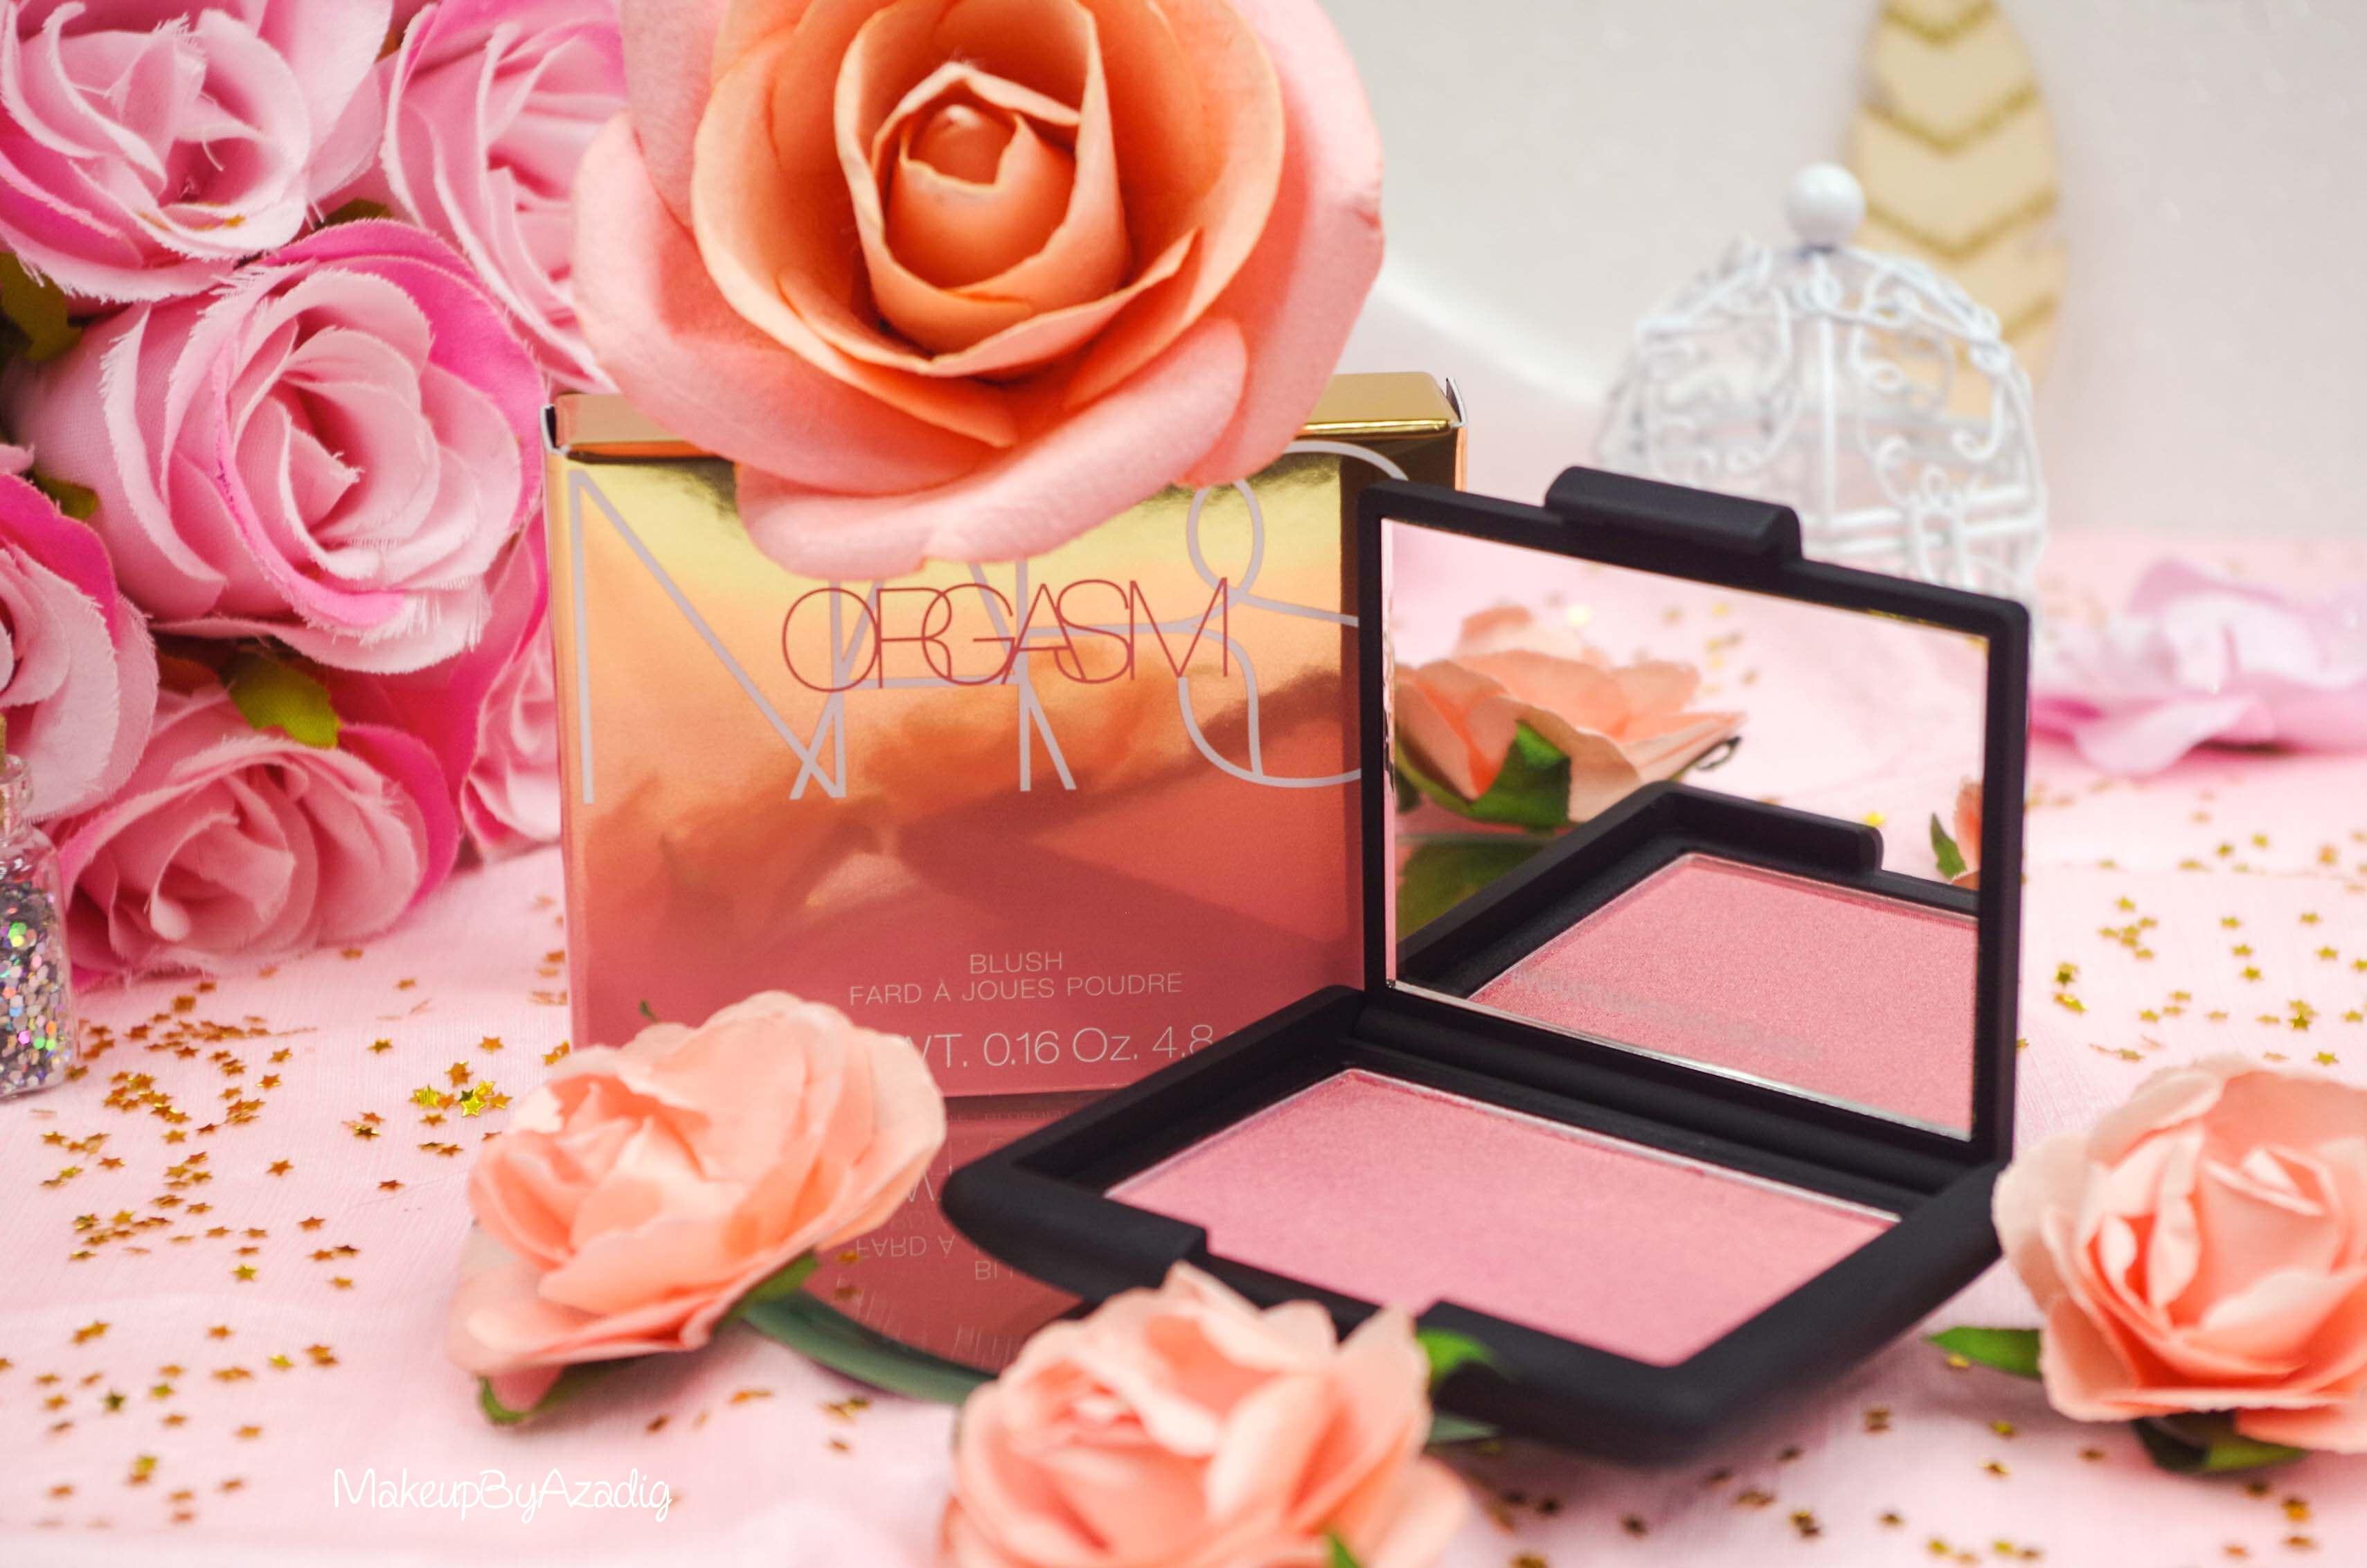 blush-liquide-orgasm-rouge-levres-illuminateur-highlighter-rosegold-nars-sephora-avis-prix-makeupbyazadig